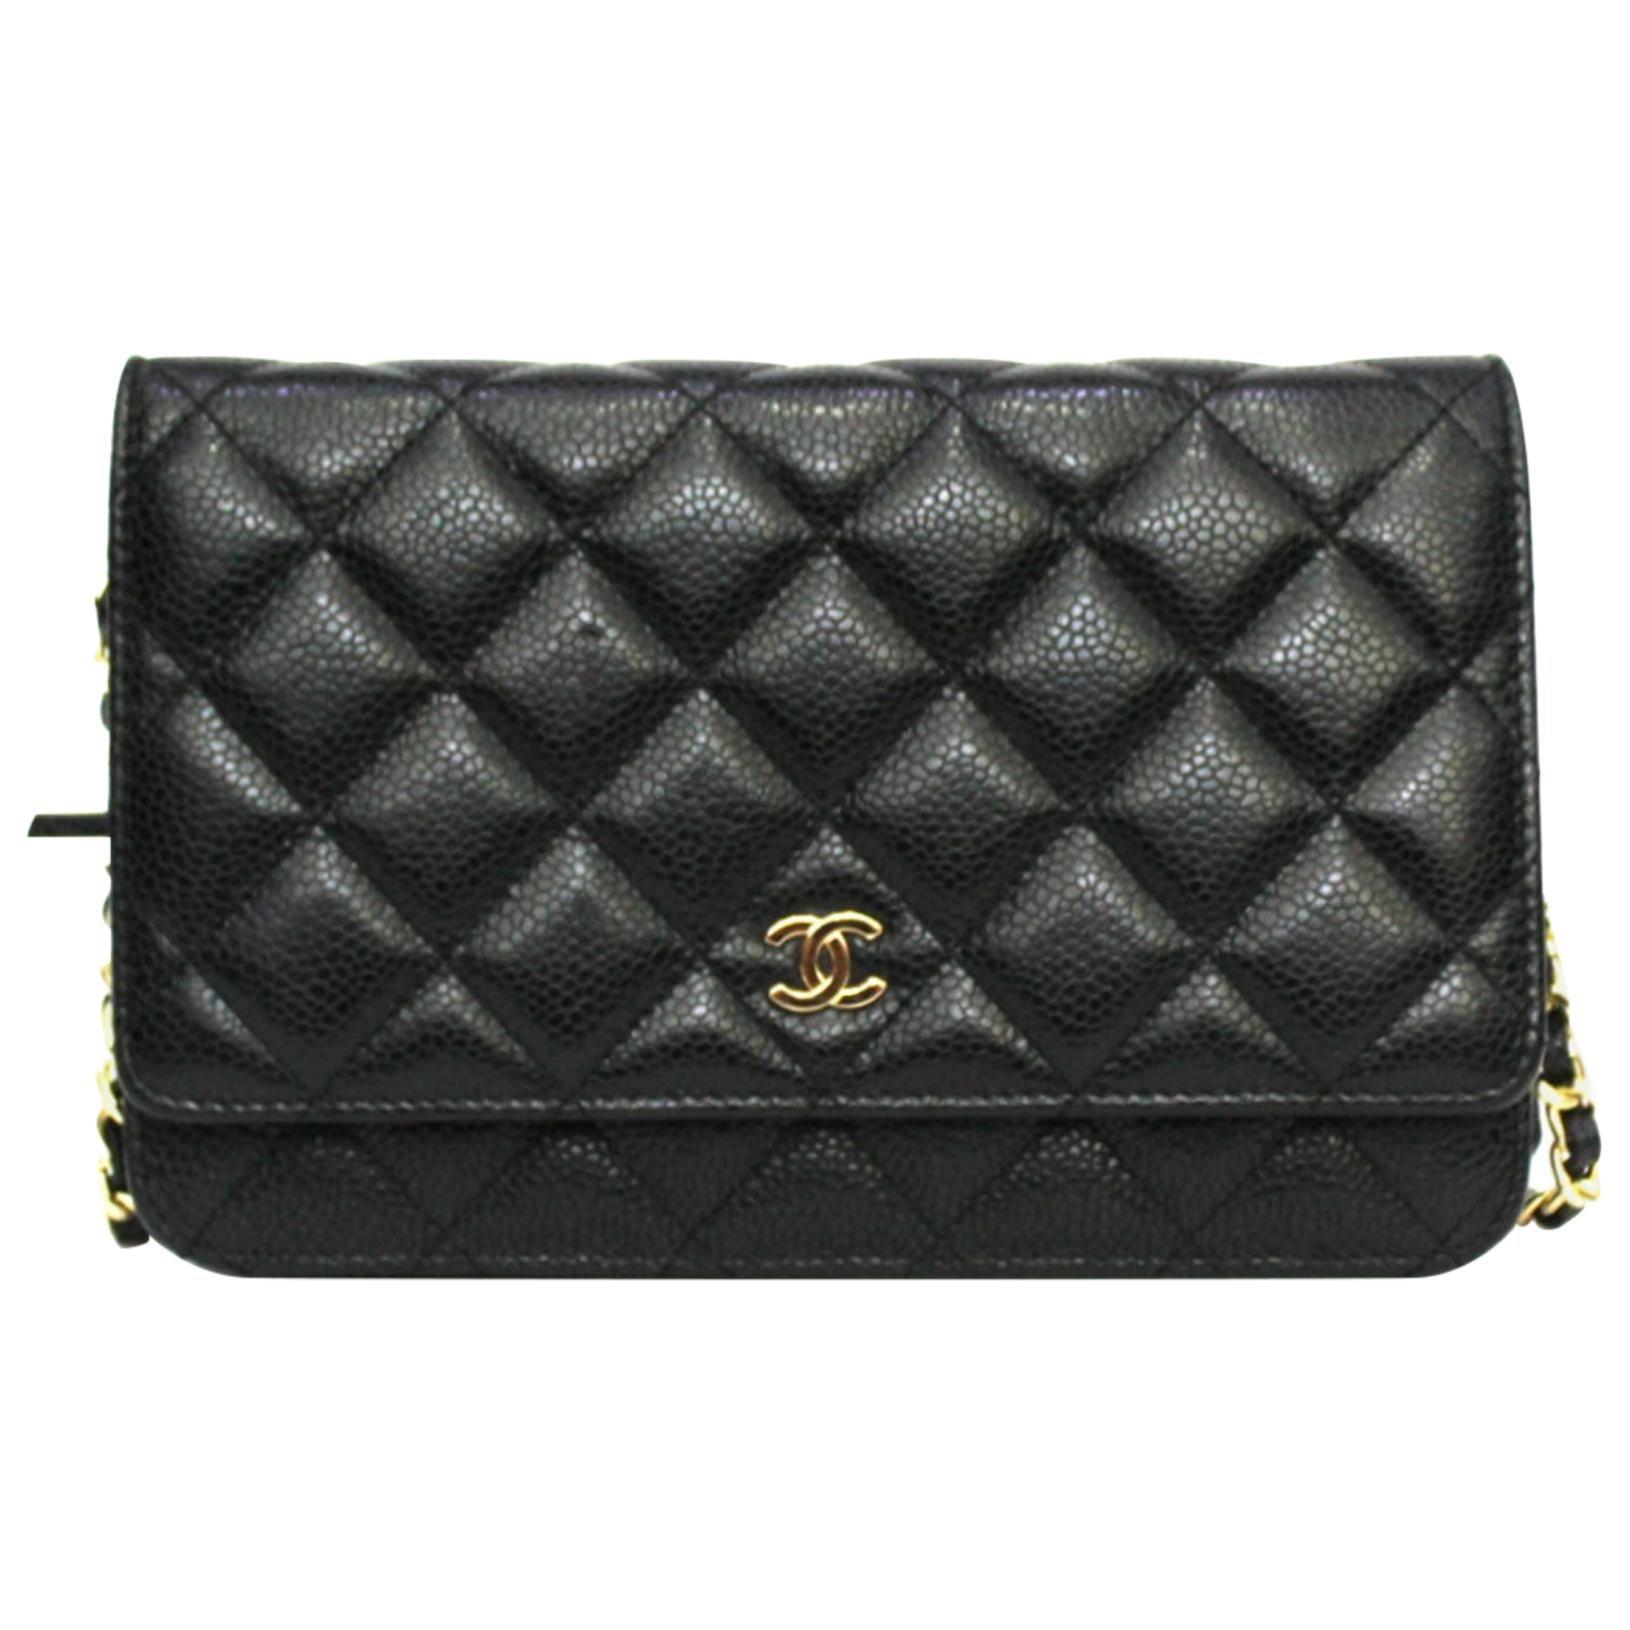 Chanel Black Learher Woc Bag